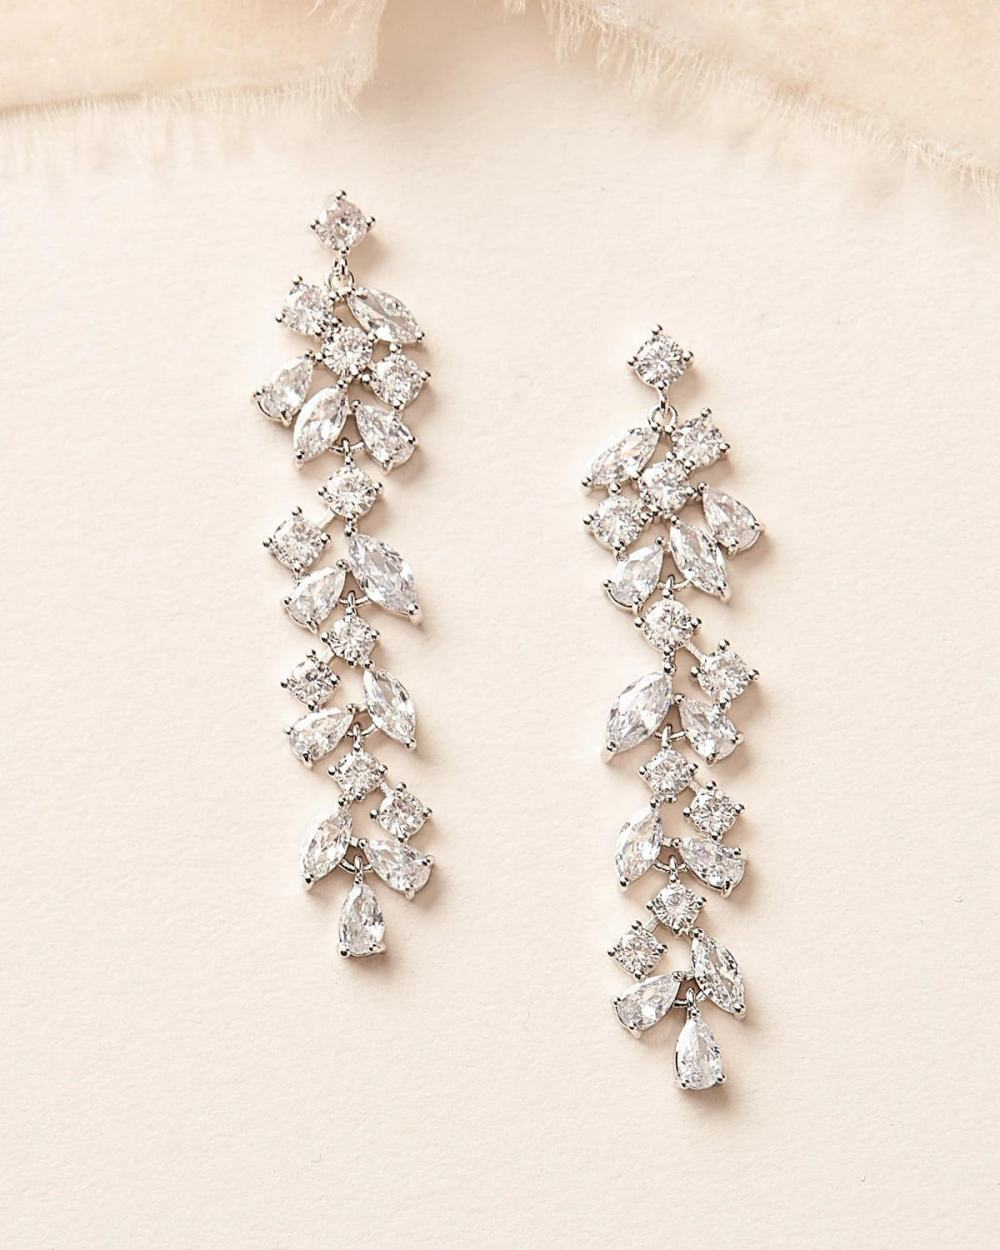 Tia_Silver Chandelier Wedding Bridal Crystal Pendant Earrings